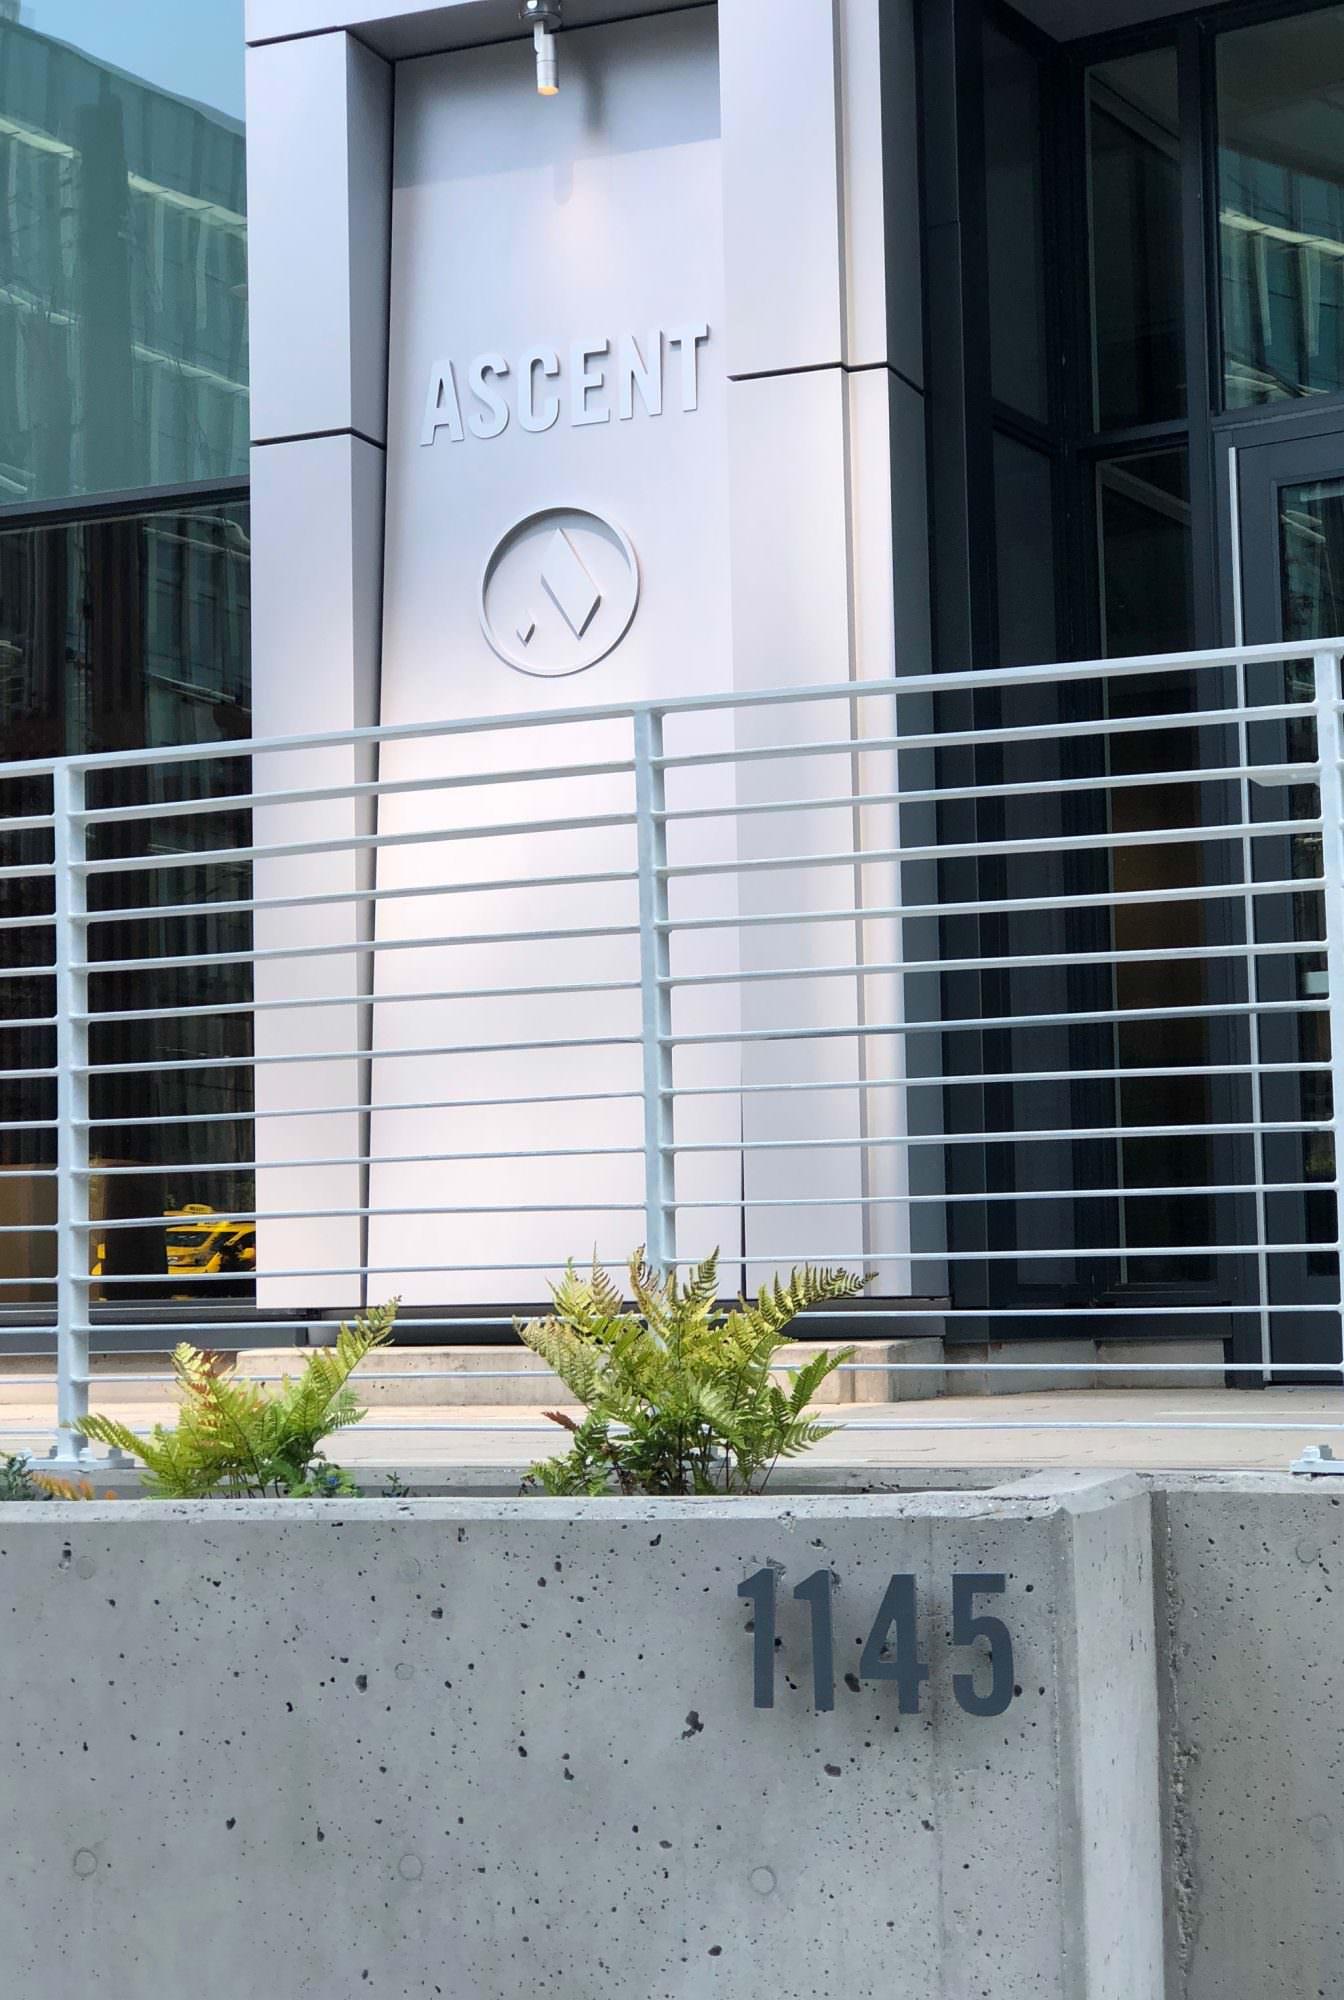 Ascent exterior signage